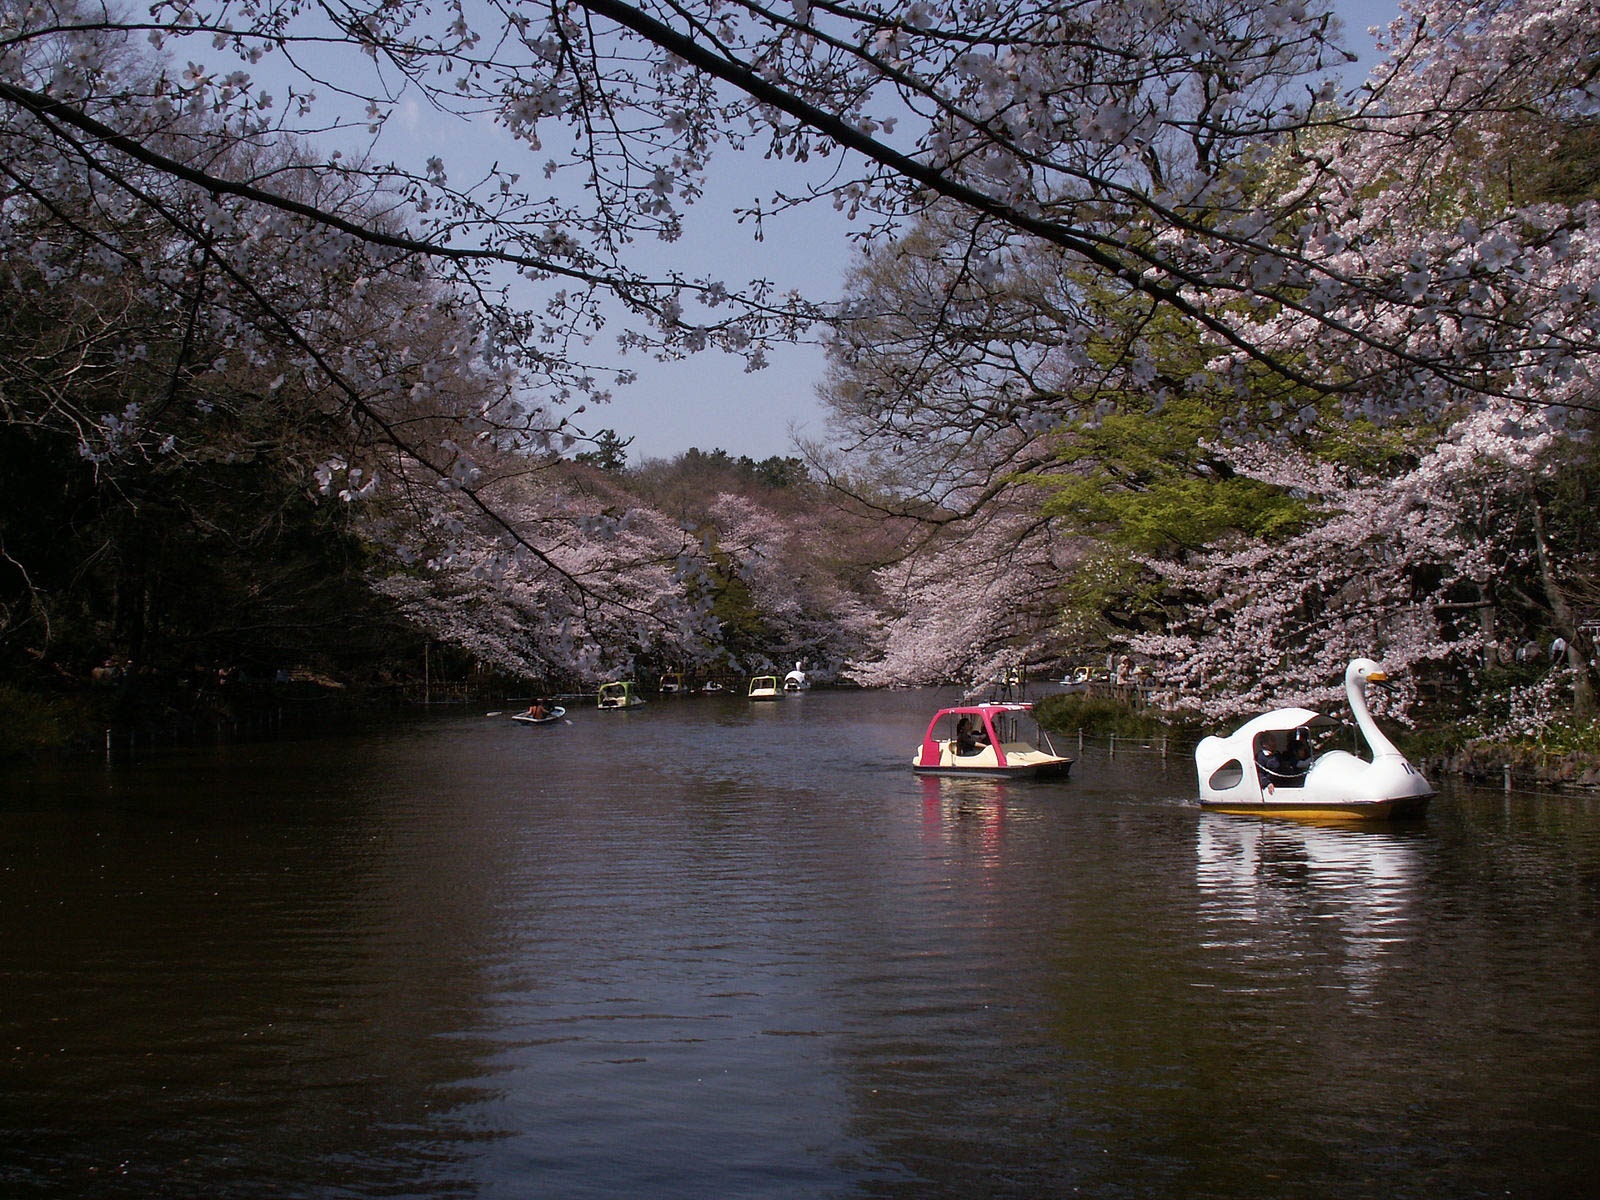 Cherry Blossom Inokashira Mitaka Travel Guide: A Quick Trip From Tokyo